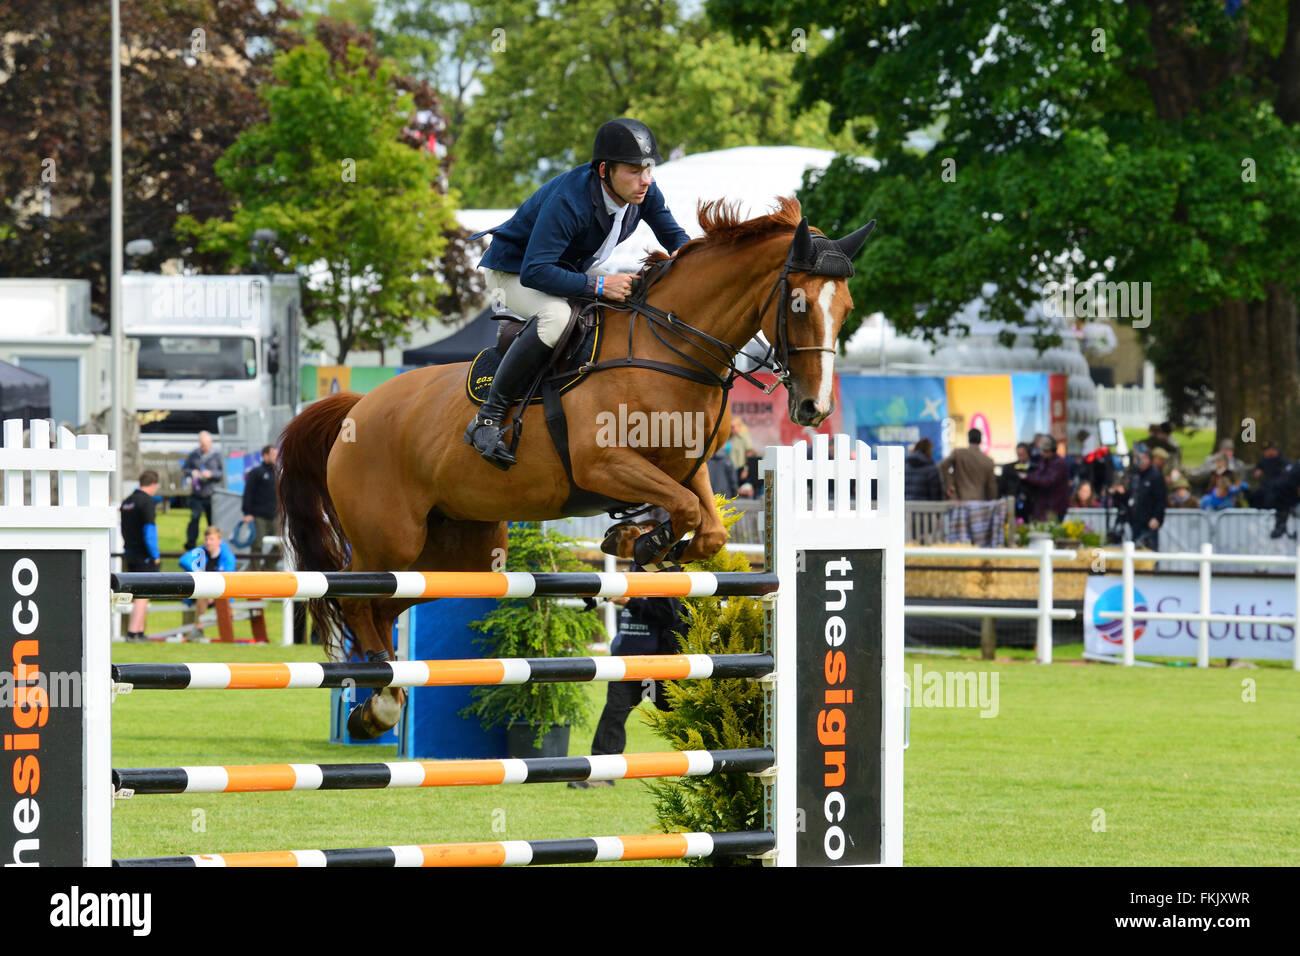 Show Jumping at Royal Highland Show 2015, Ingliston, Édimbourg, Écosse, Royaume-Uni Photo Stock